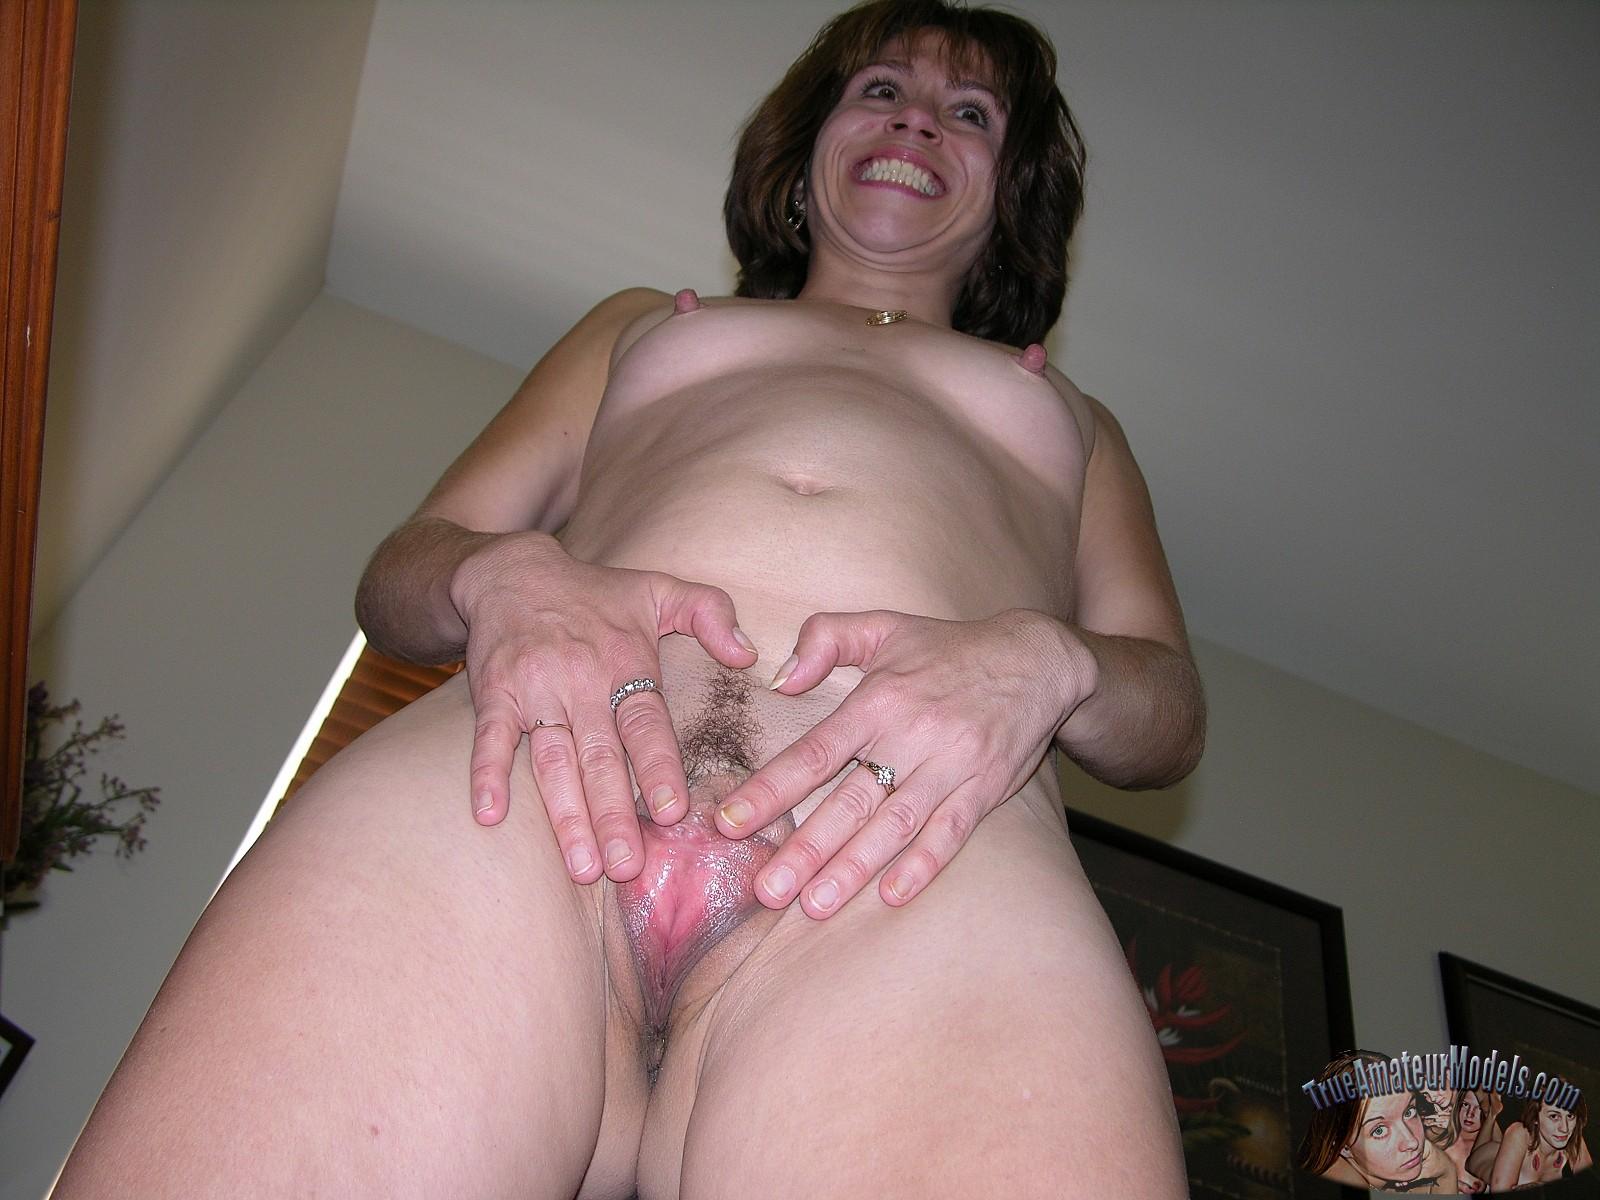 Nude milf amature